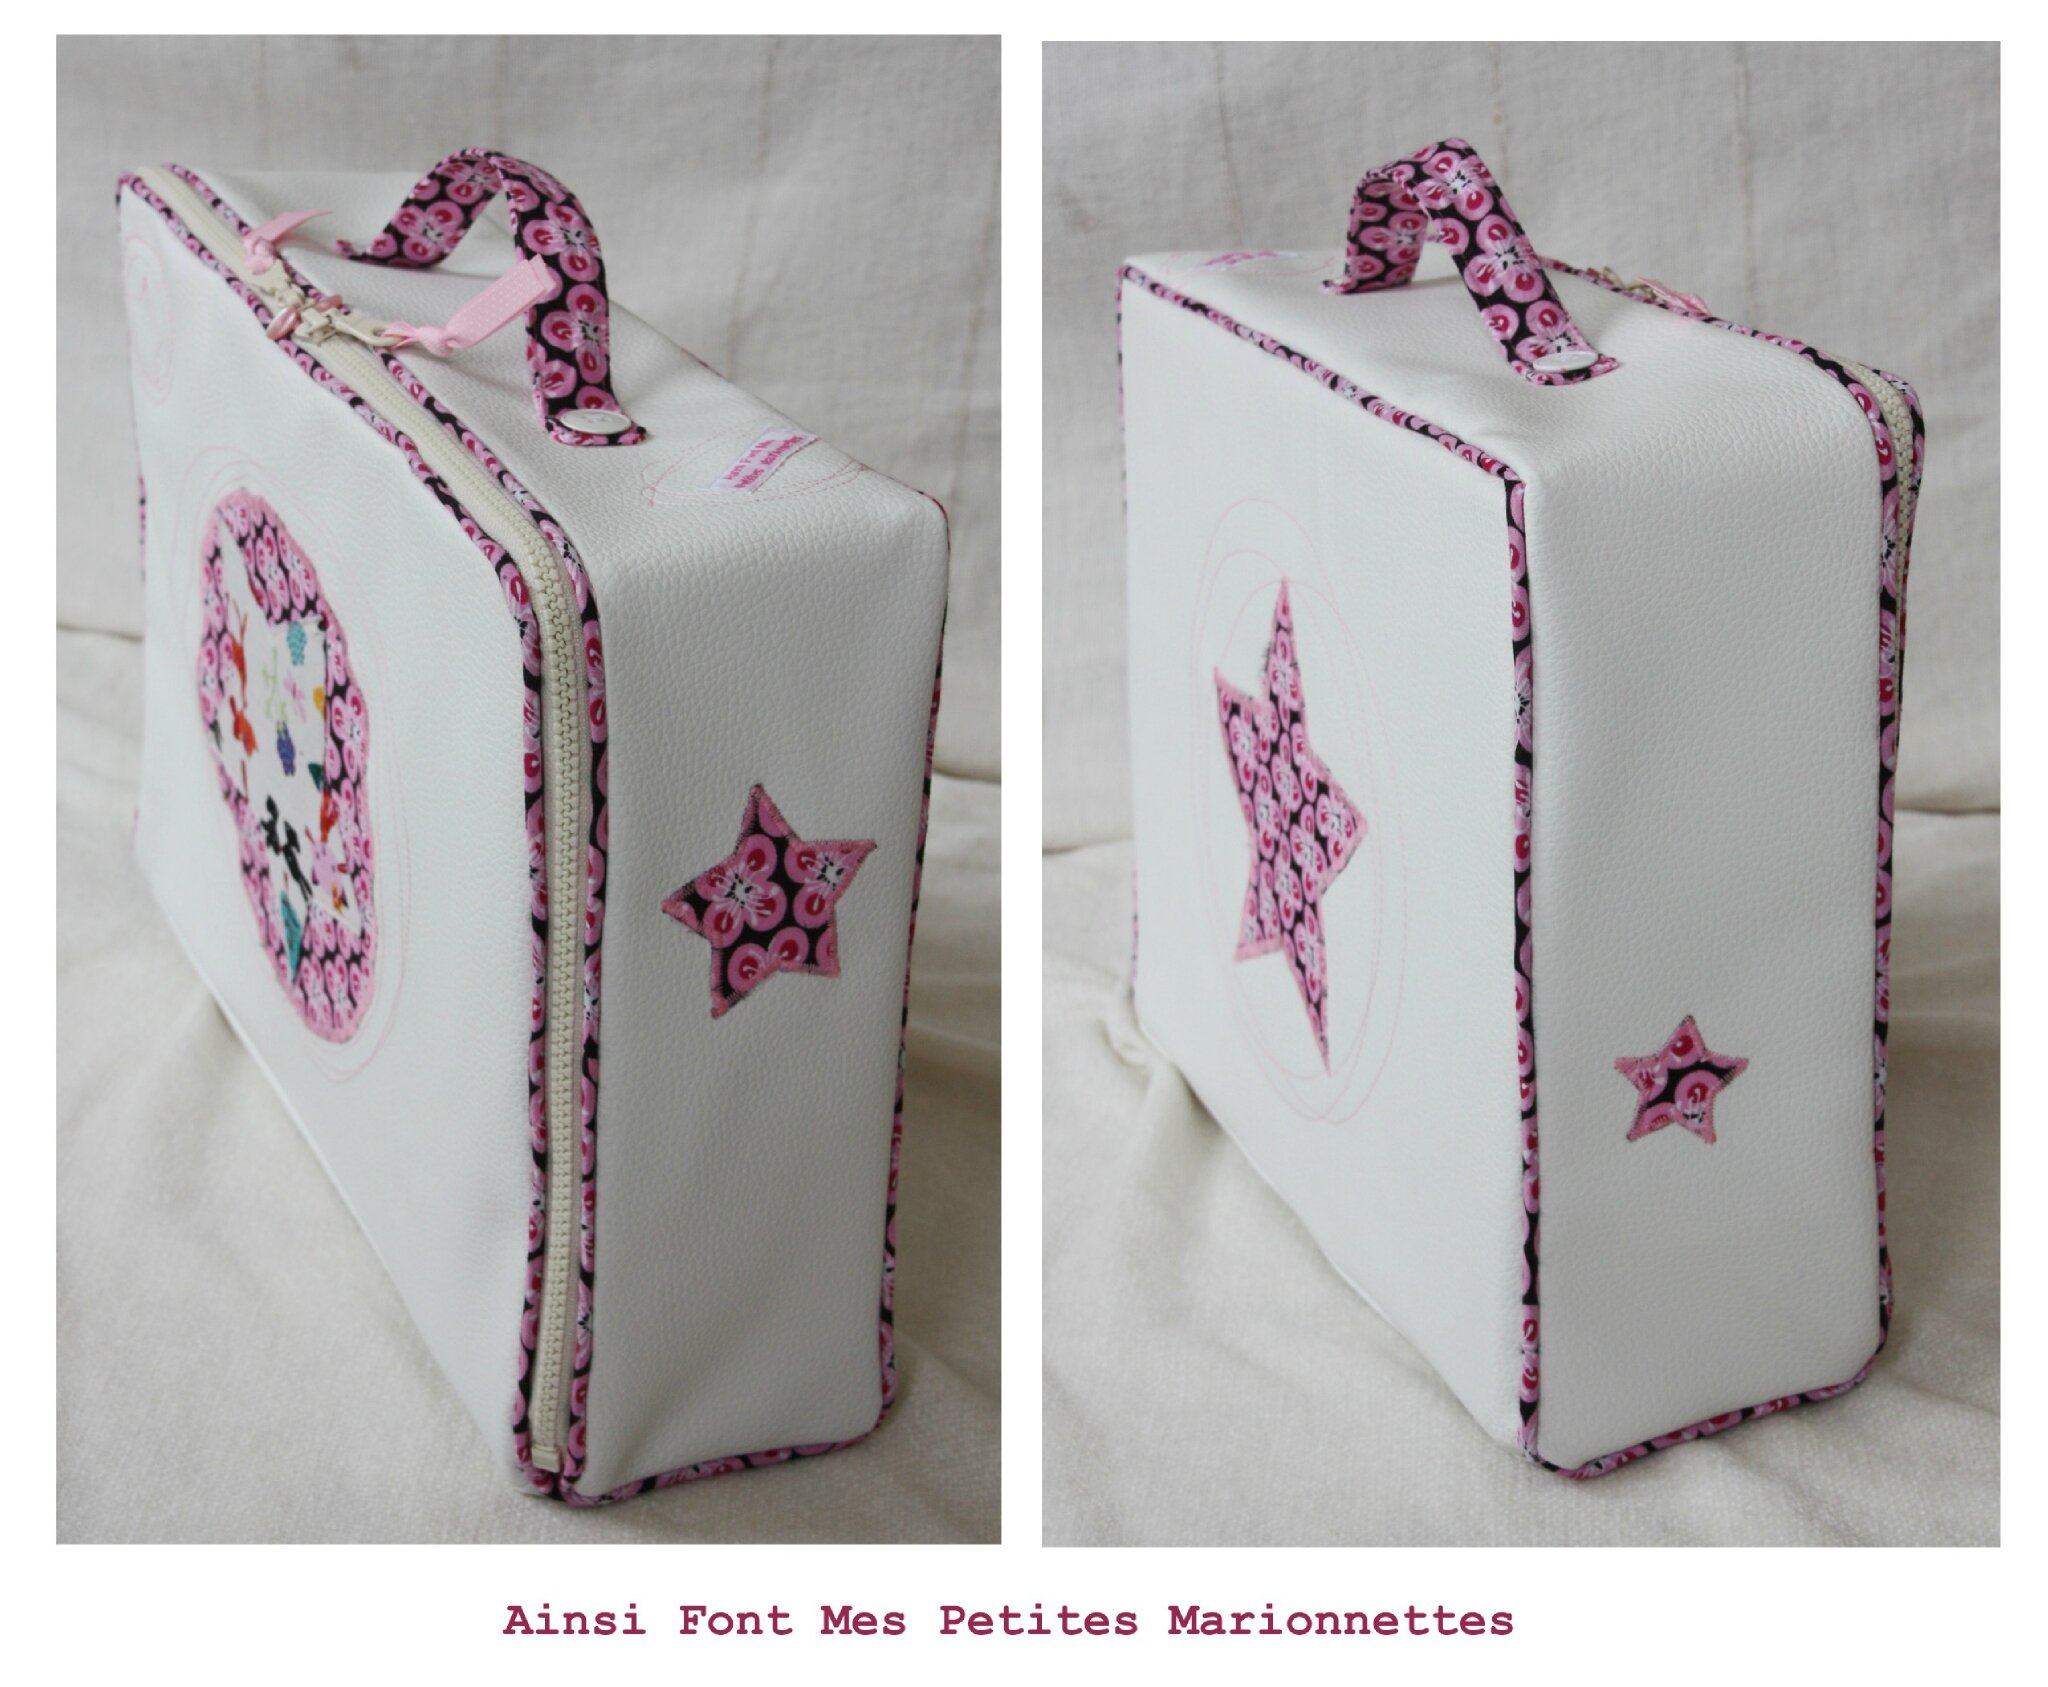 poupee valise 7